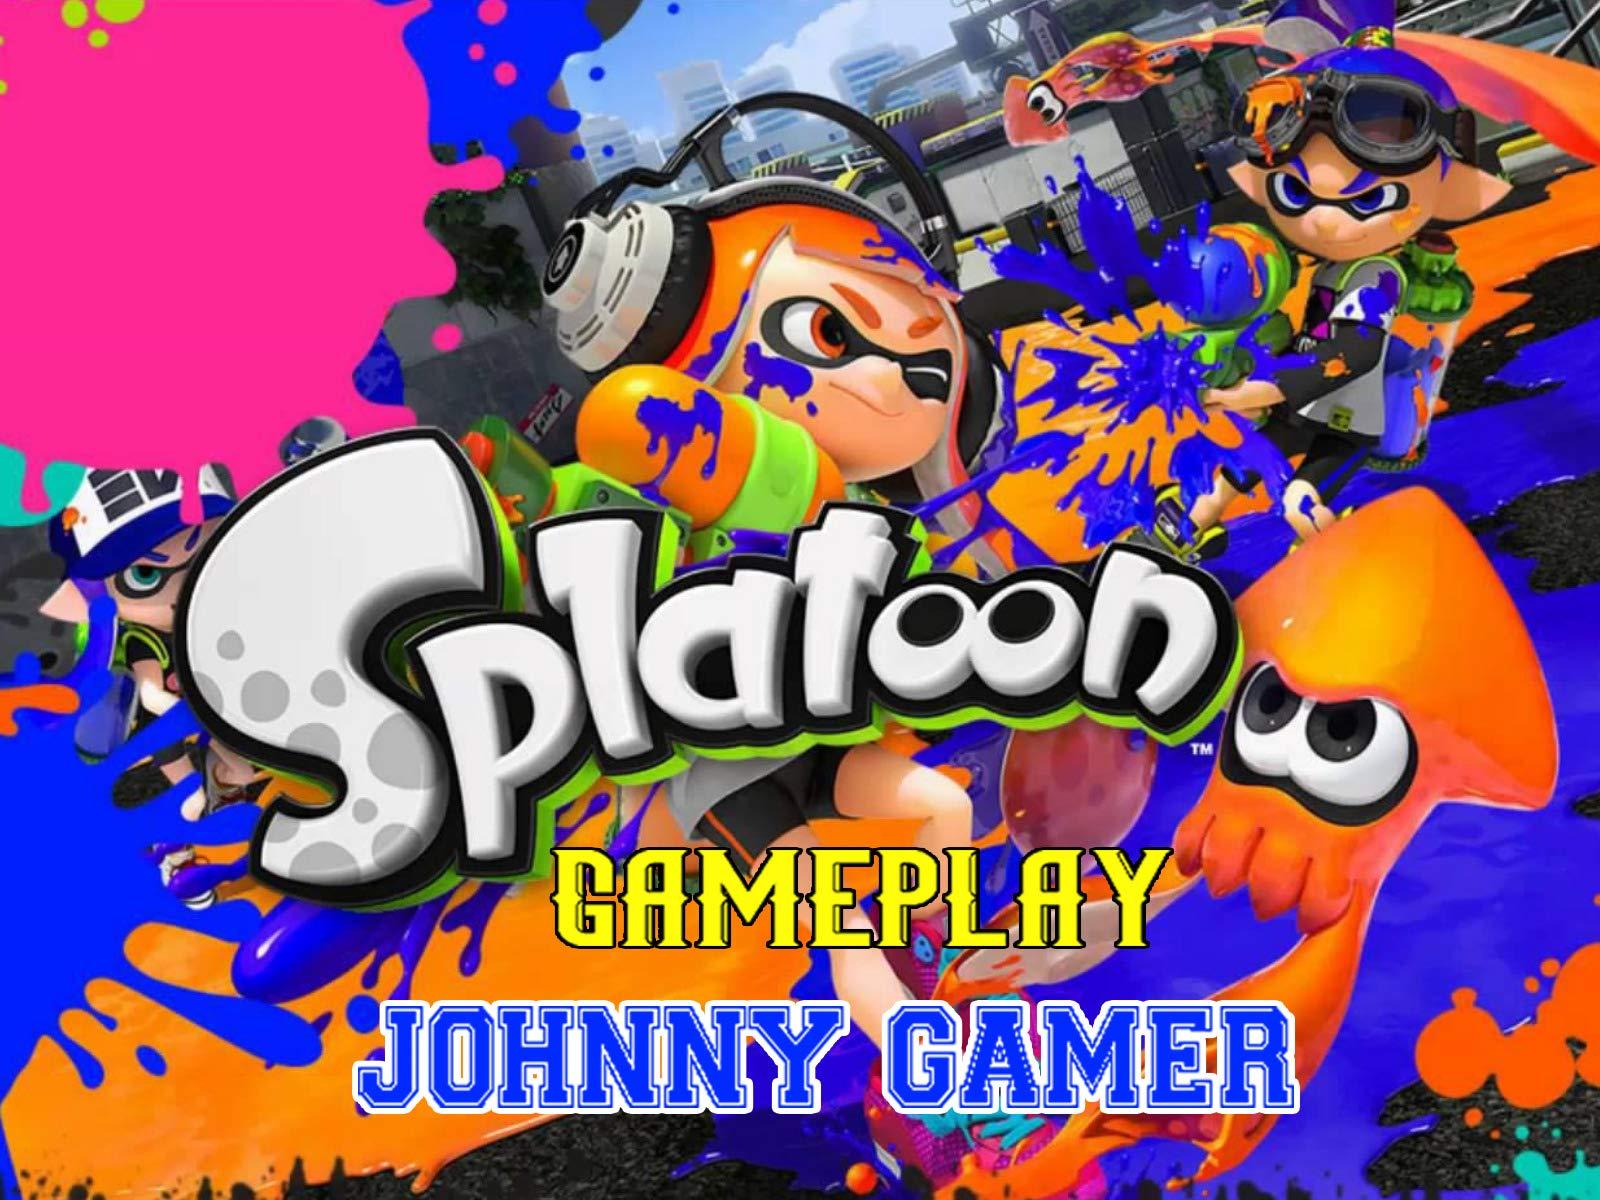 Clip: Splatoon Gameplay - Johnny Gamer - Season 1